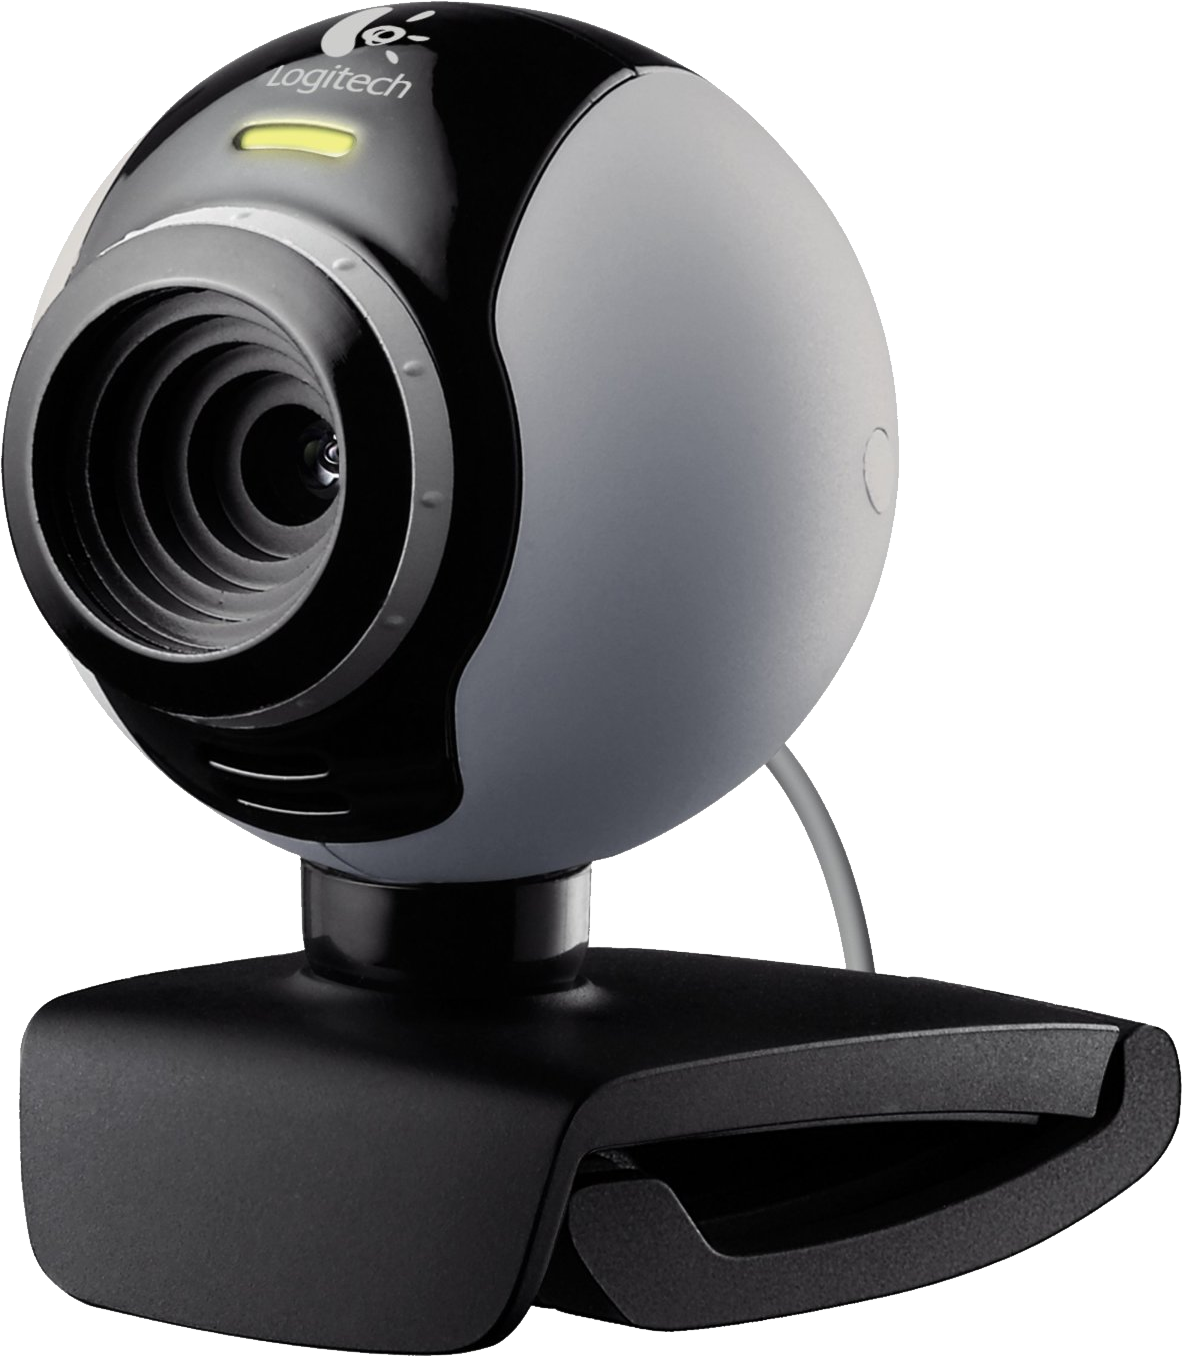 Web camera online video